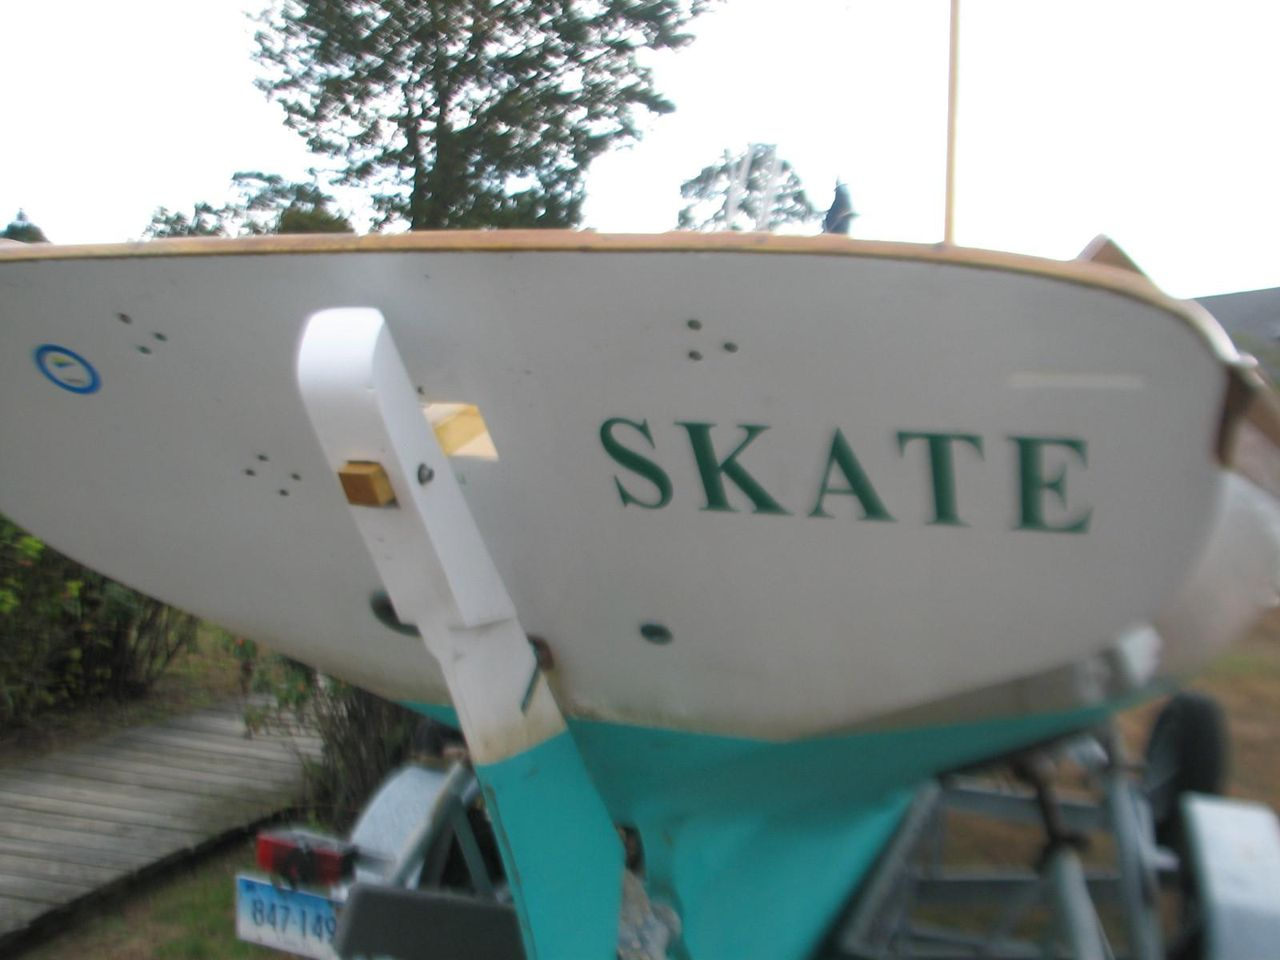 1988 Used Golden Era Petrel Daysailer Sailboat For Sale - $24,000